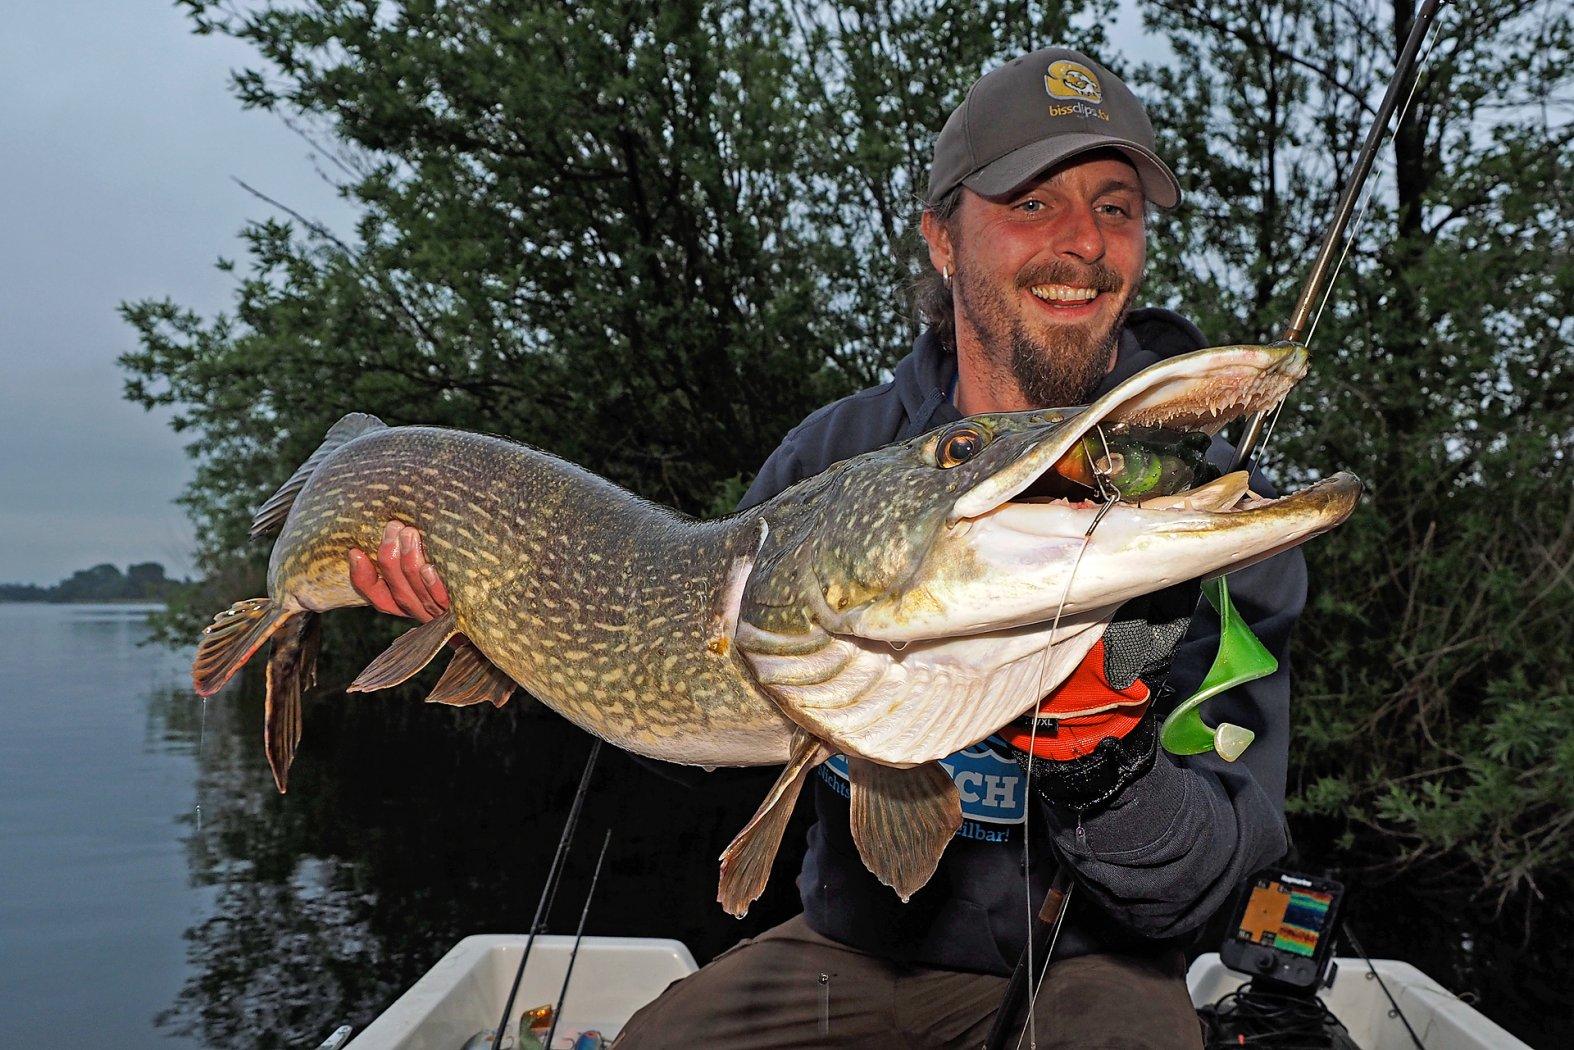 große Hechte angeln